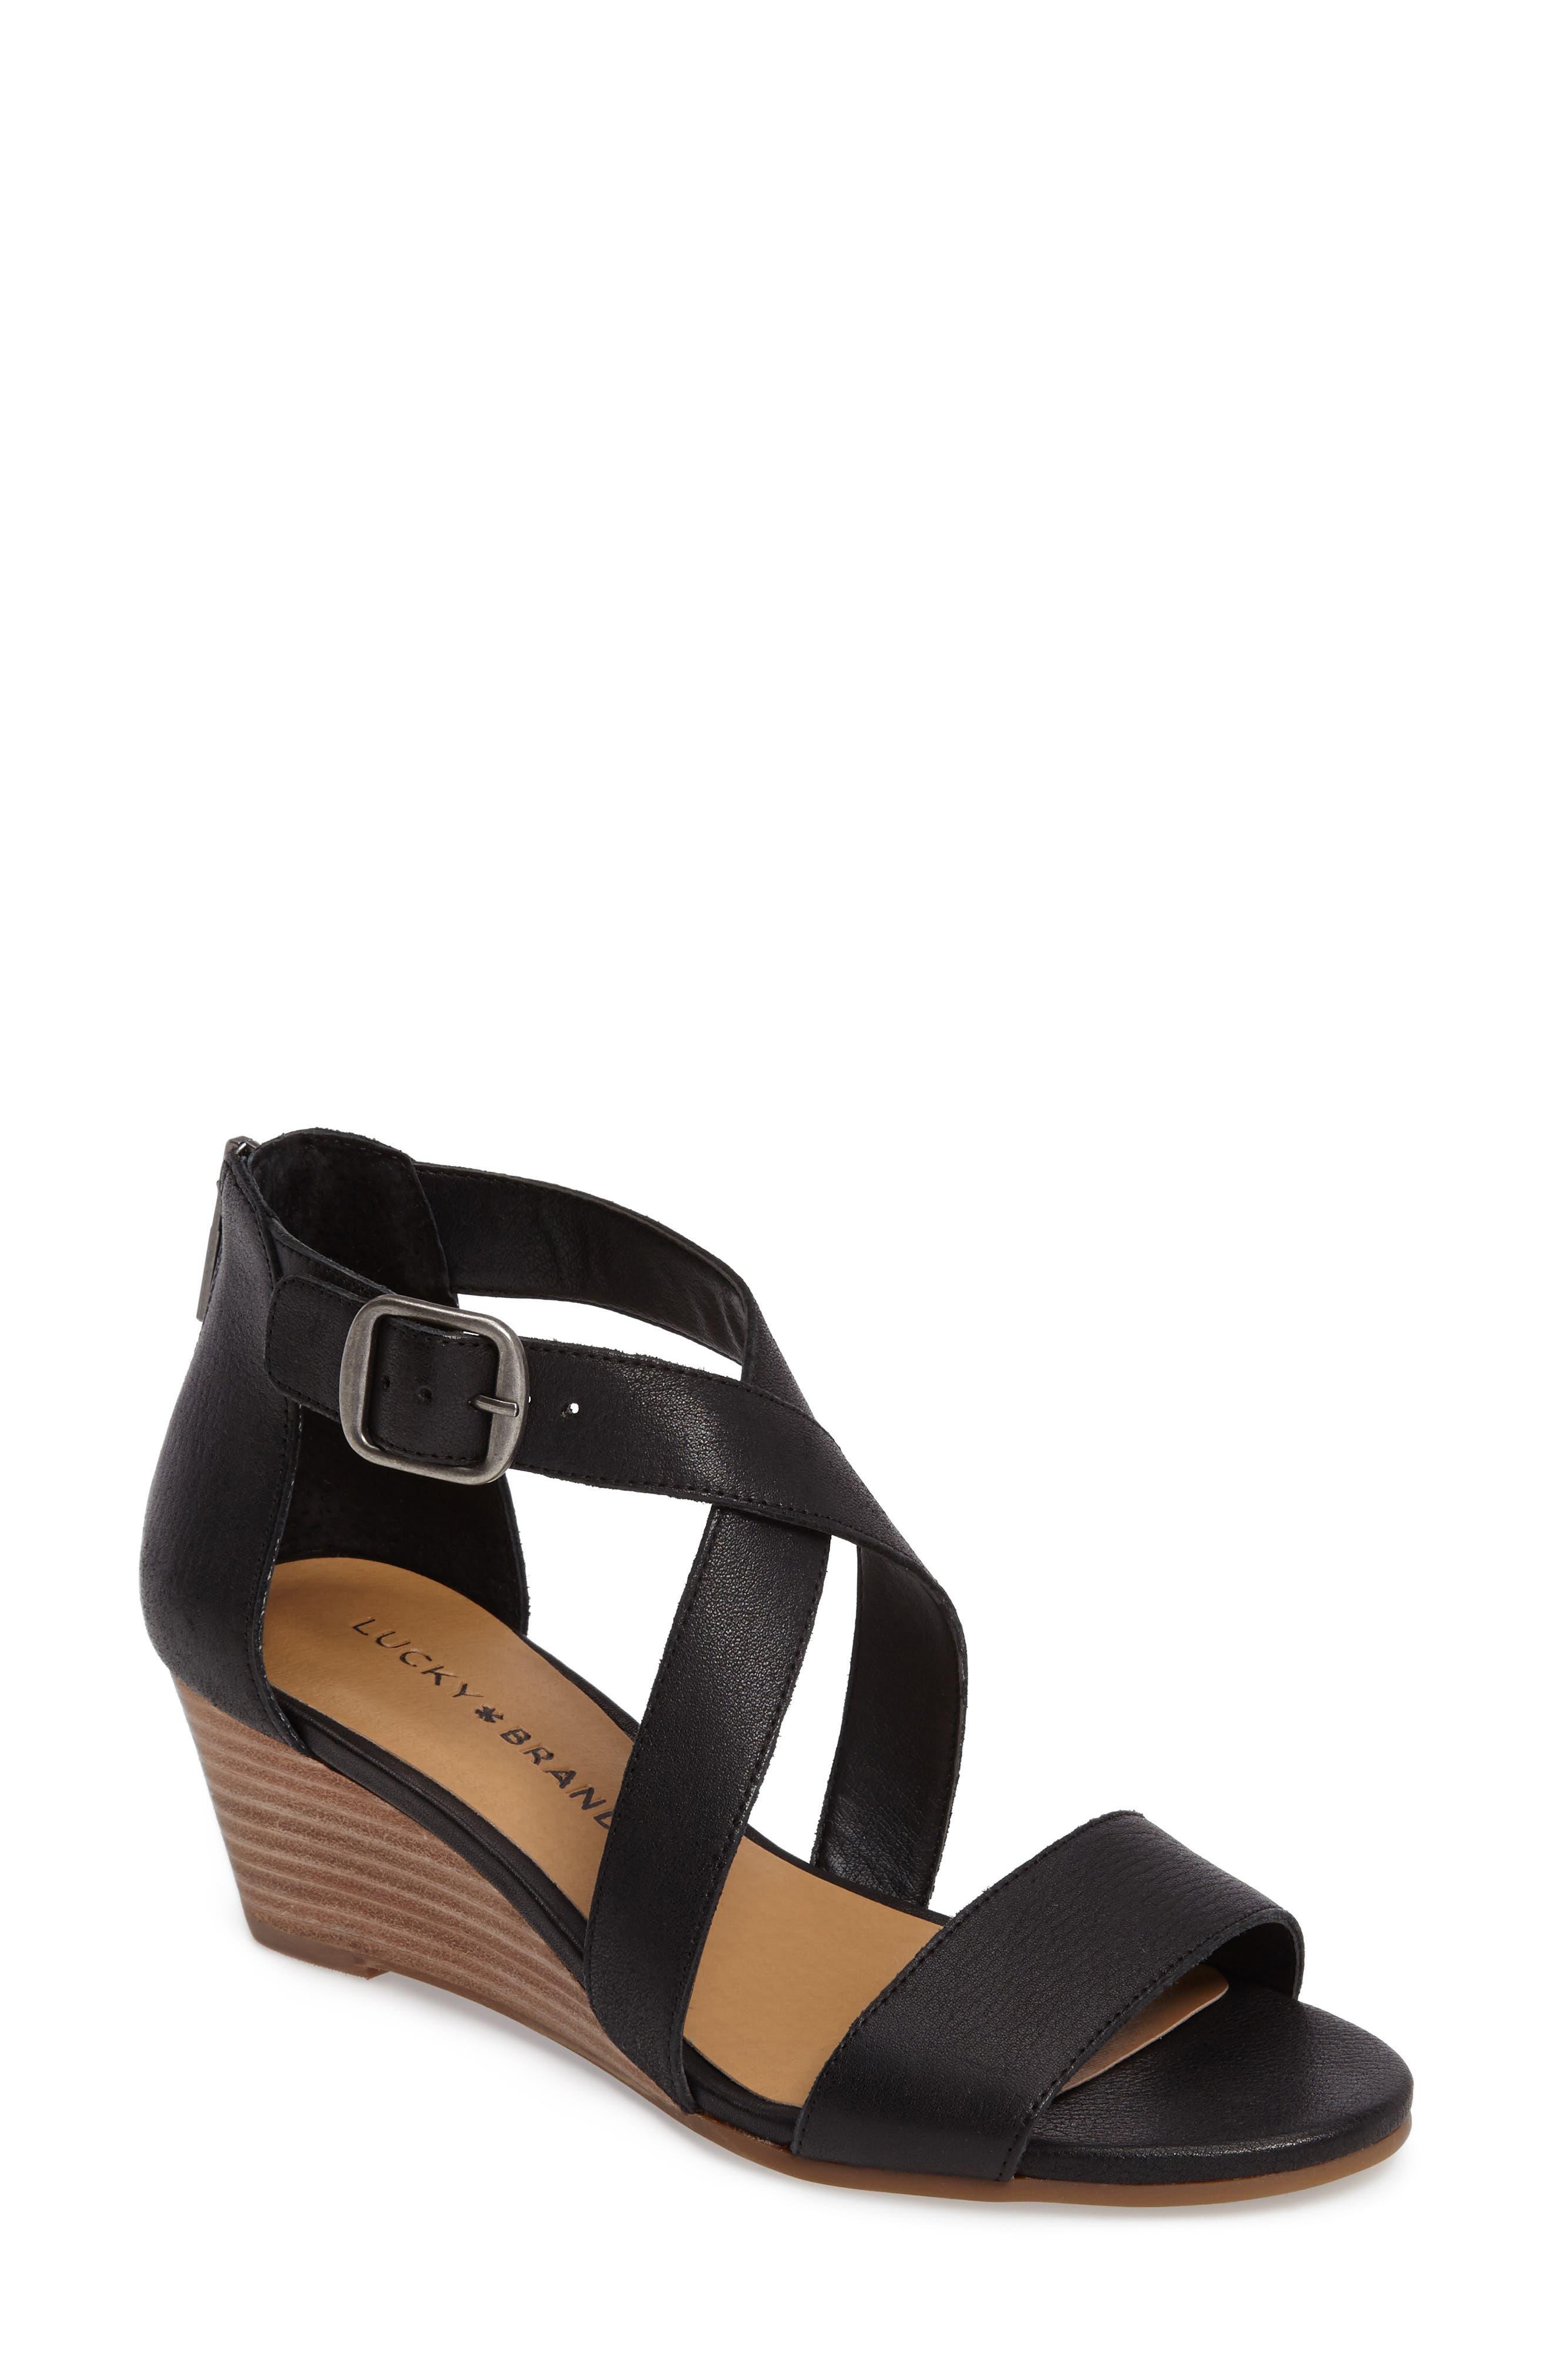 Jenley Wedge Sandal,                         Main,                         color, 001